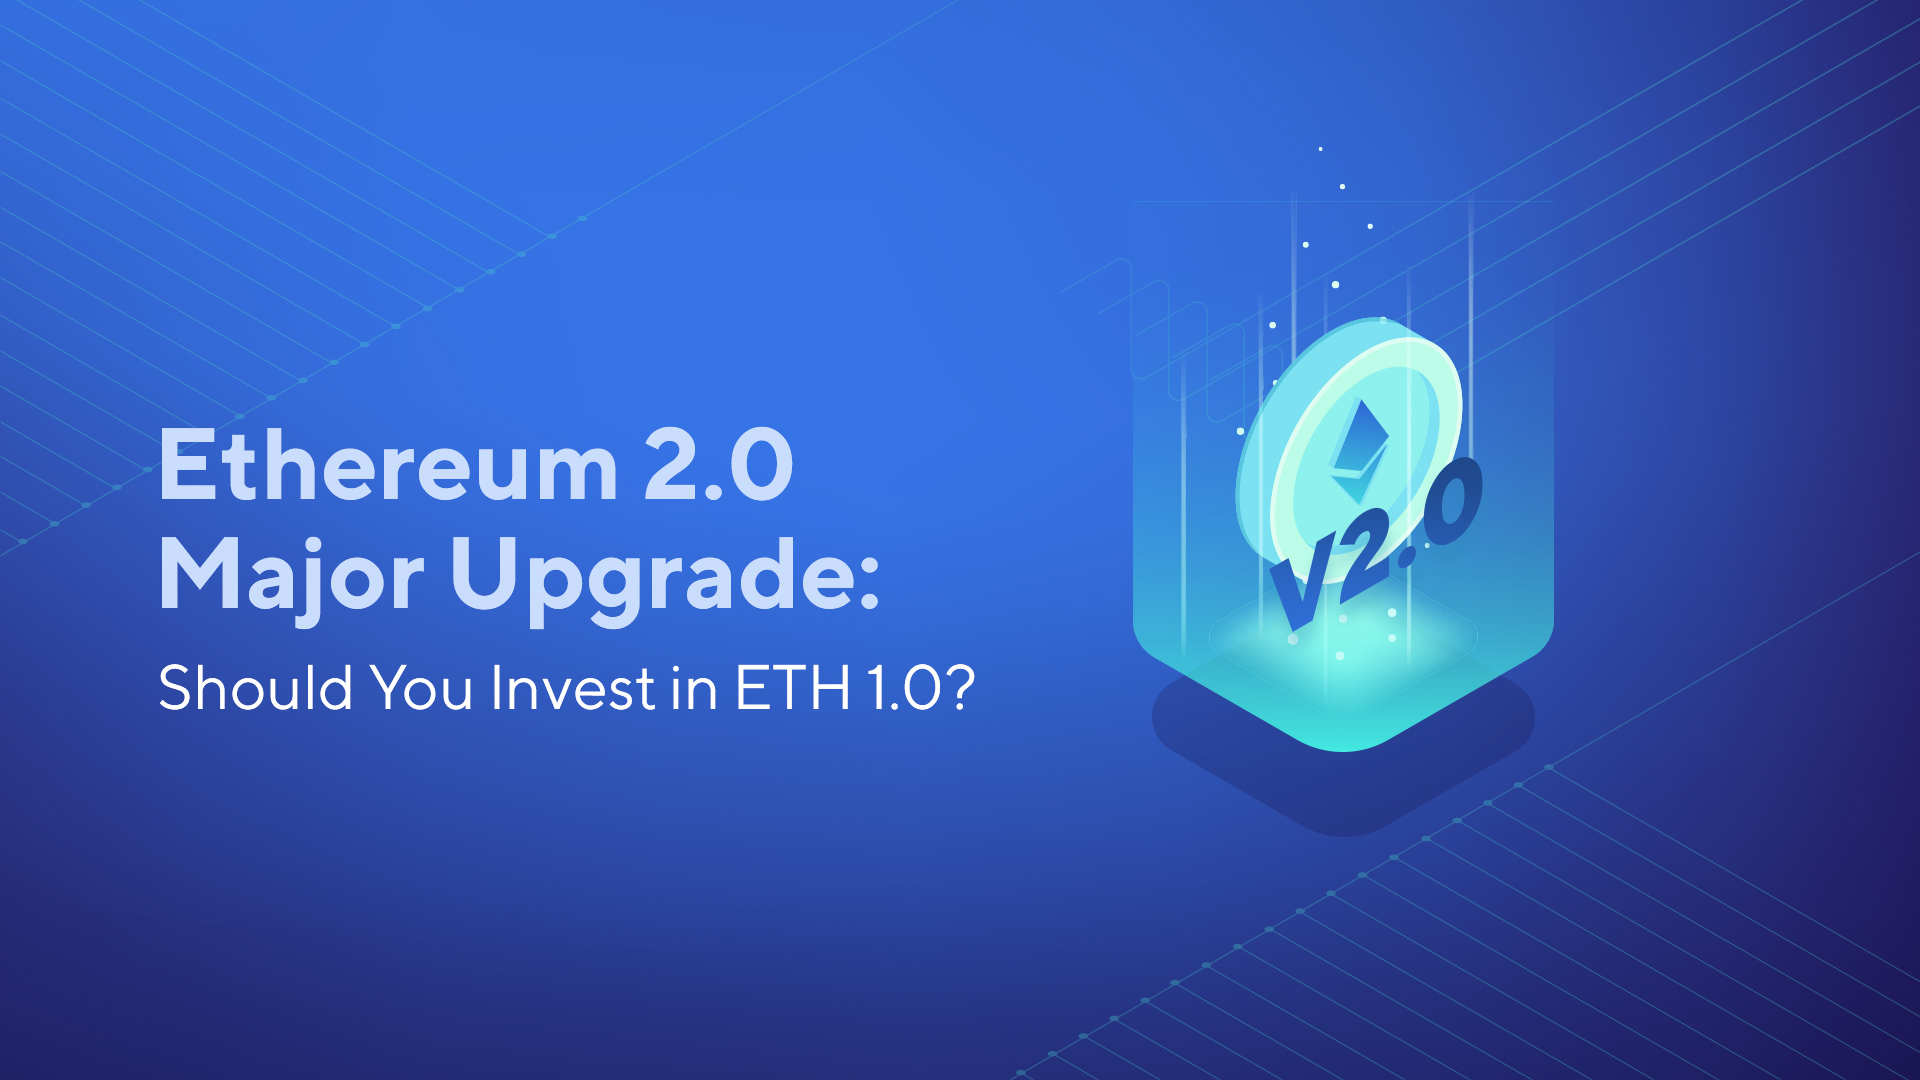 Ethereum 2.0 Major Upgrade: Should You Invest in ETH 1.0?